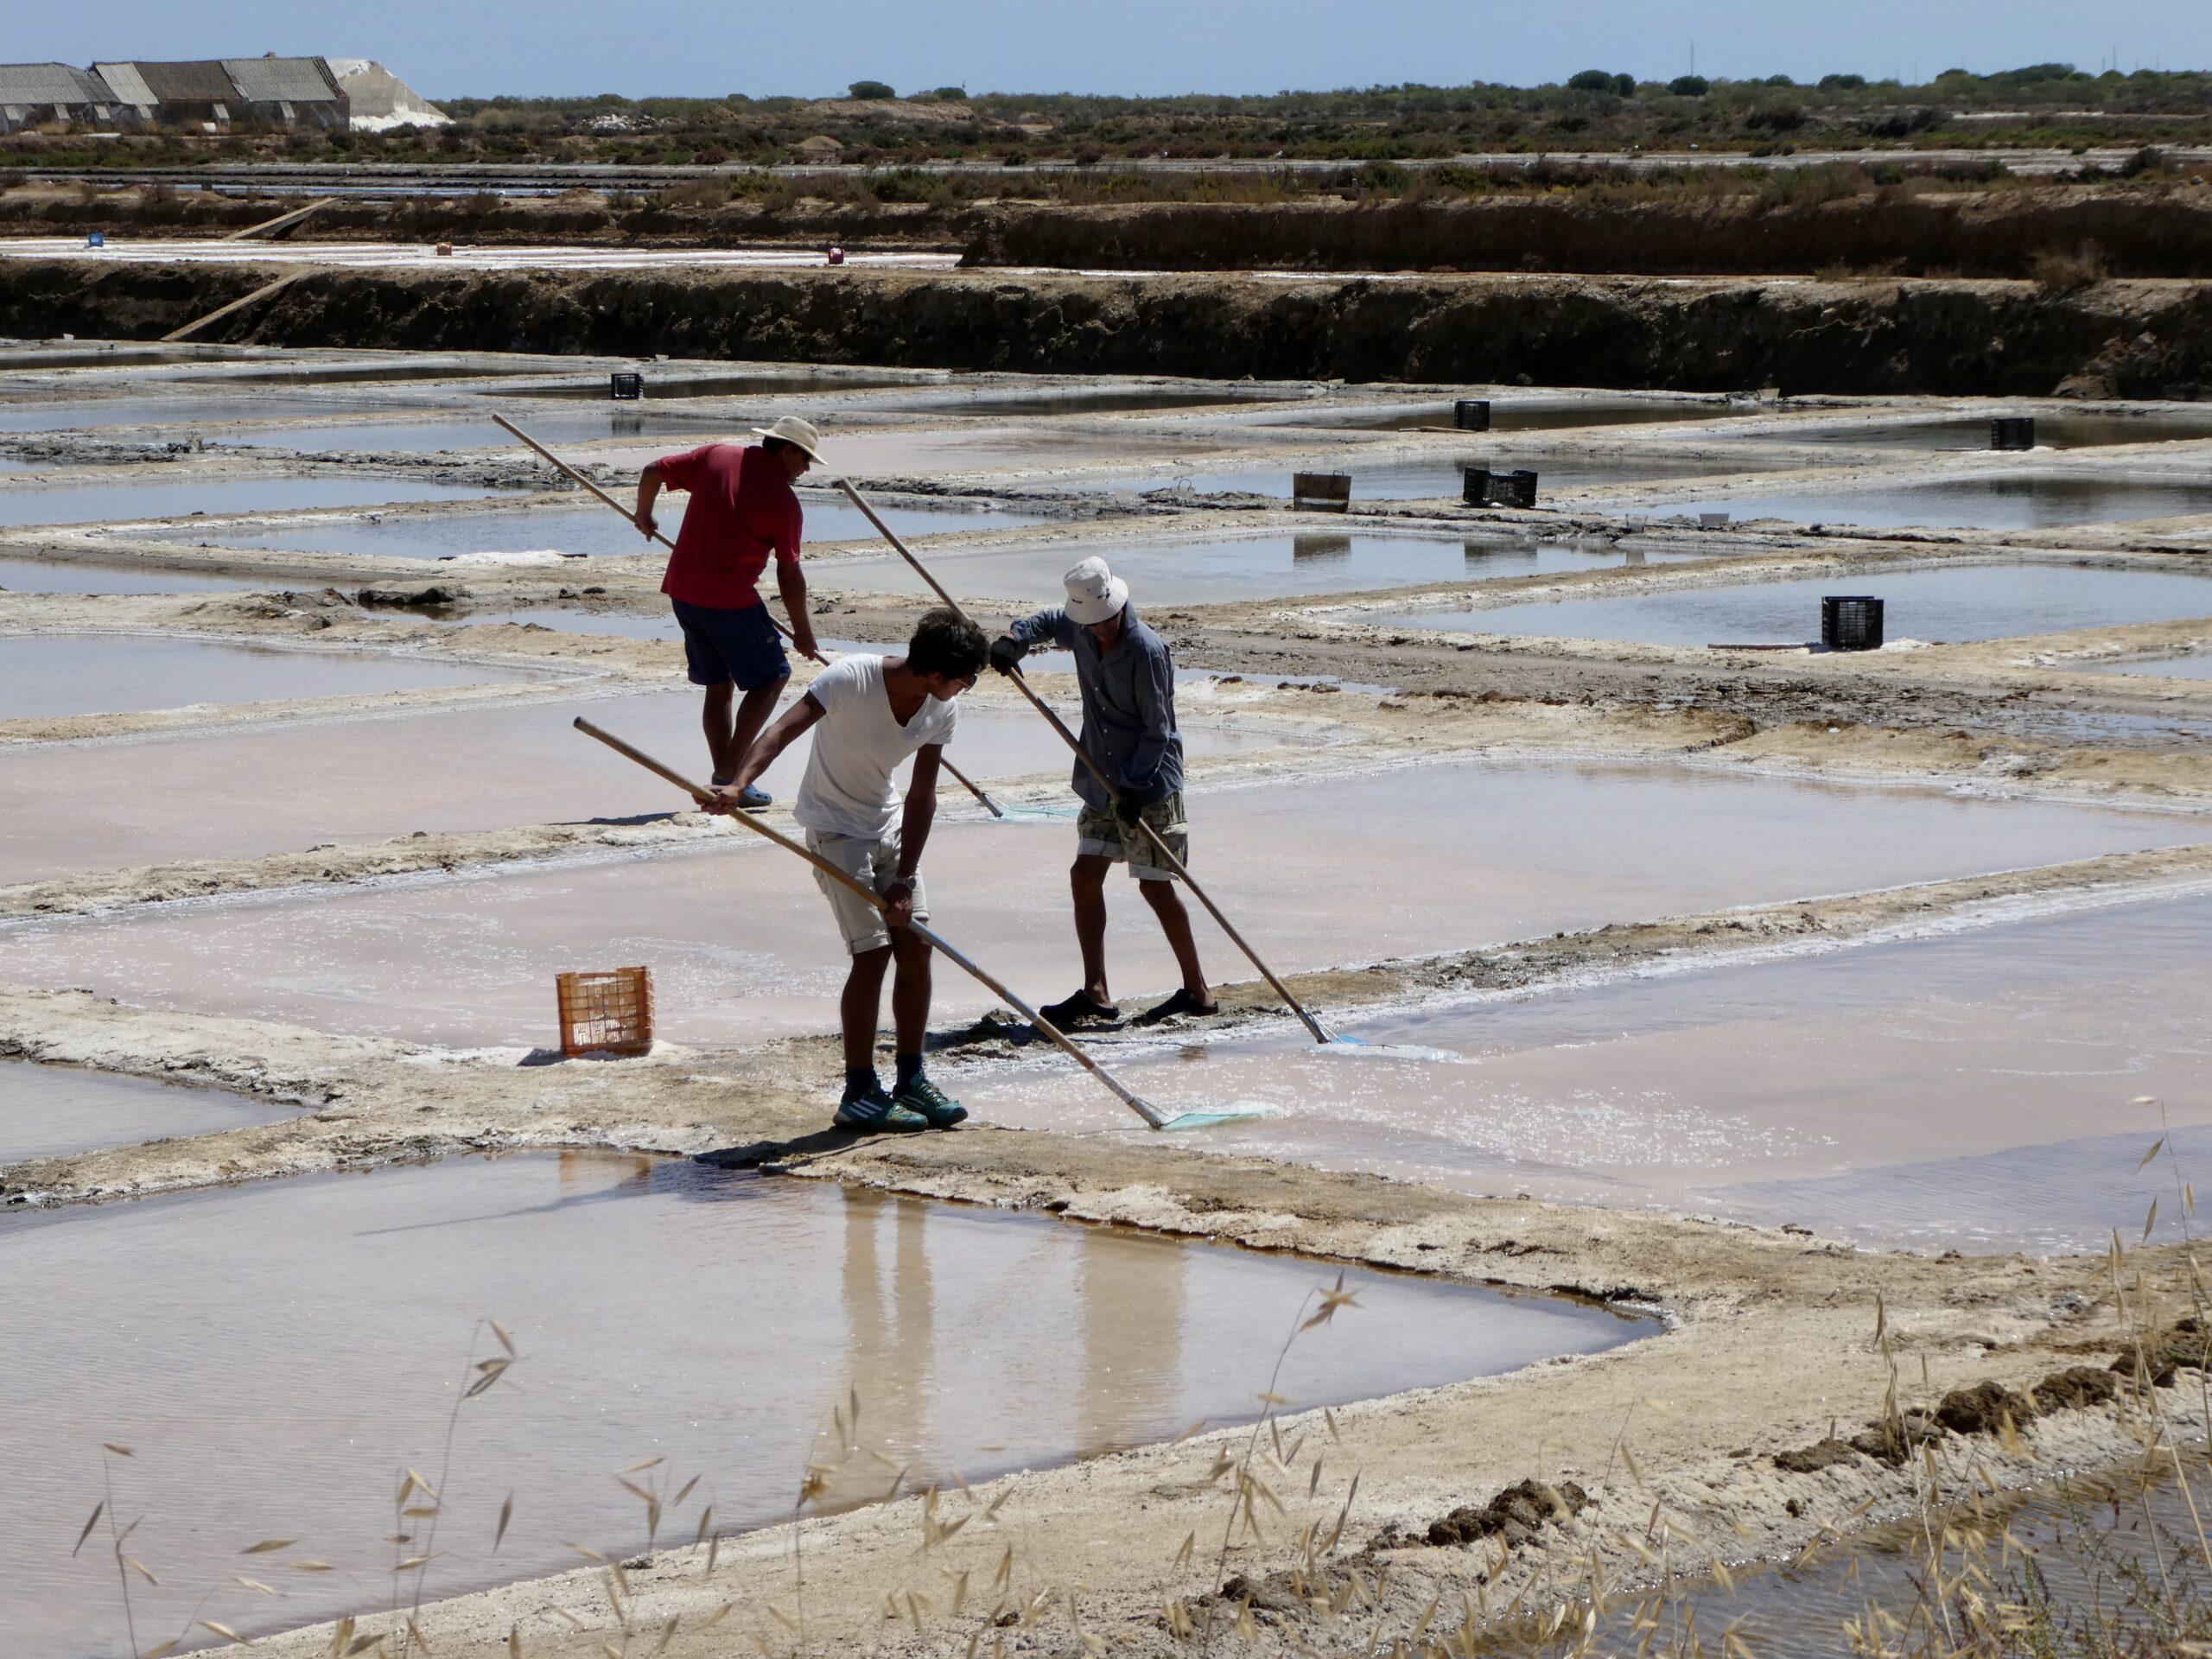 Workers at the Tavira Salt Pans